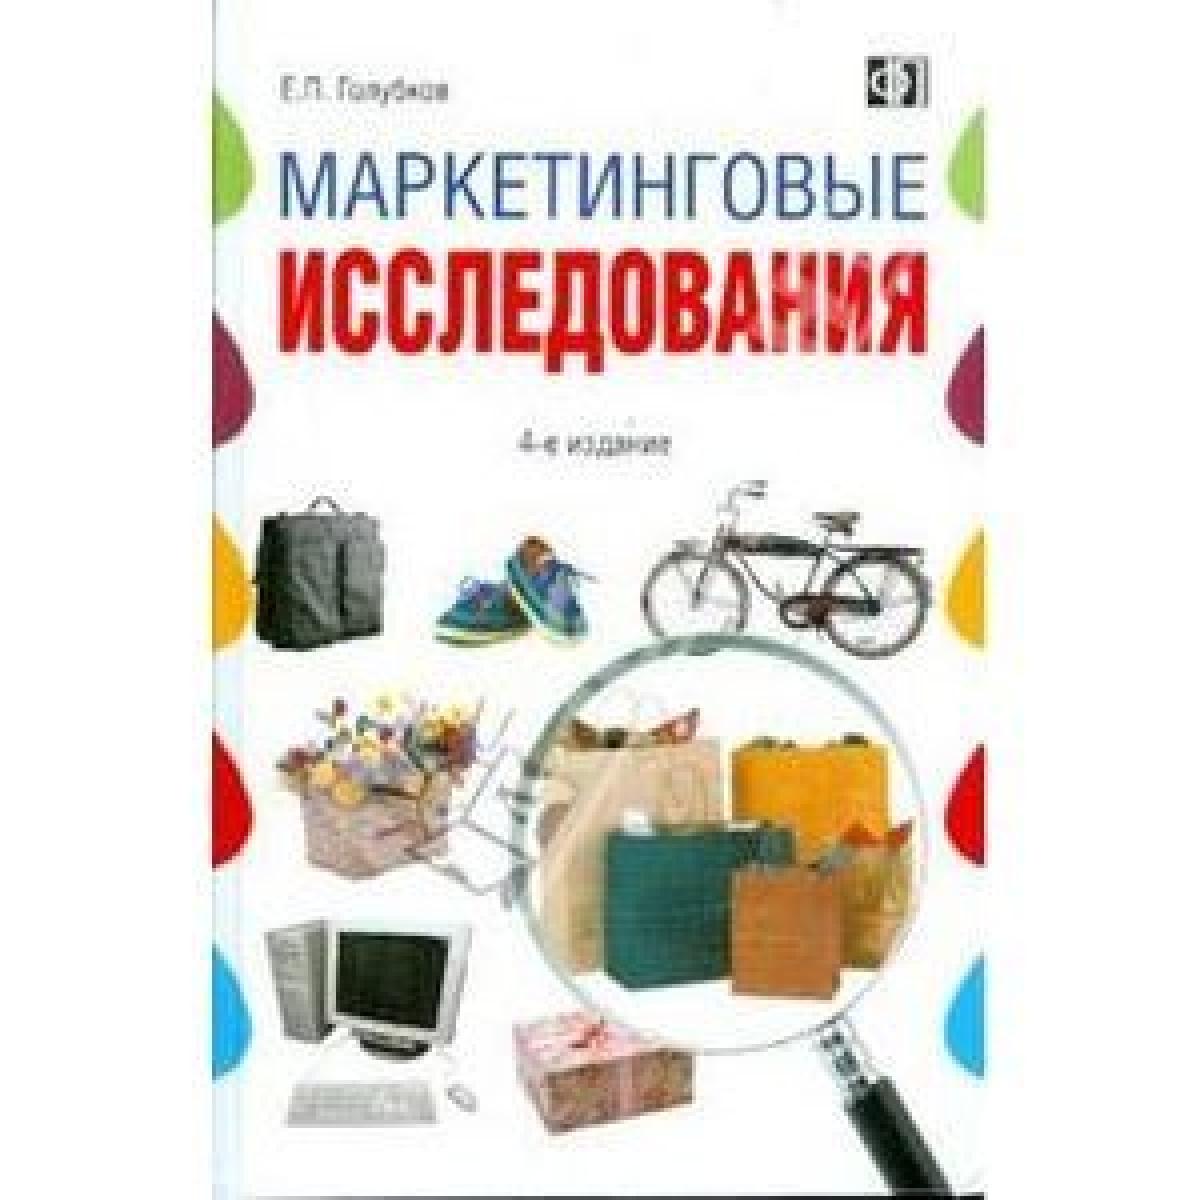 Обложка книги:  голубков е.п - маркетинговые исследования теория, методология и практика